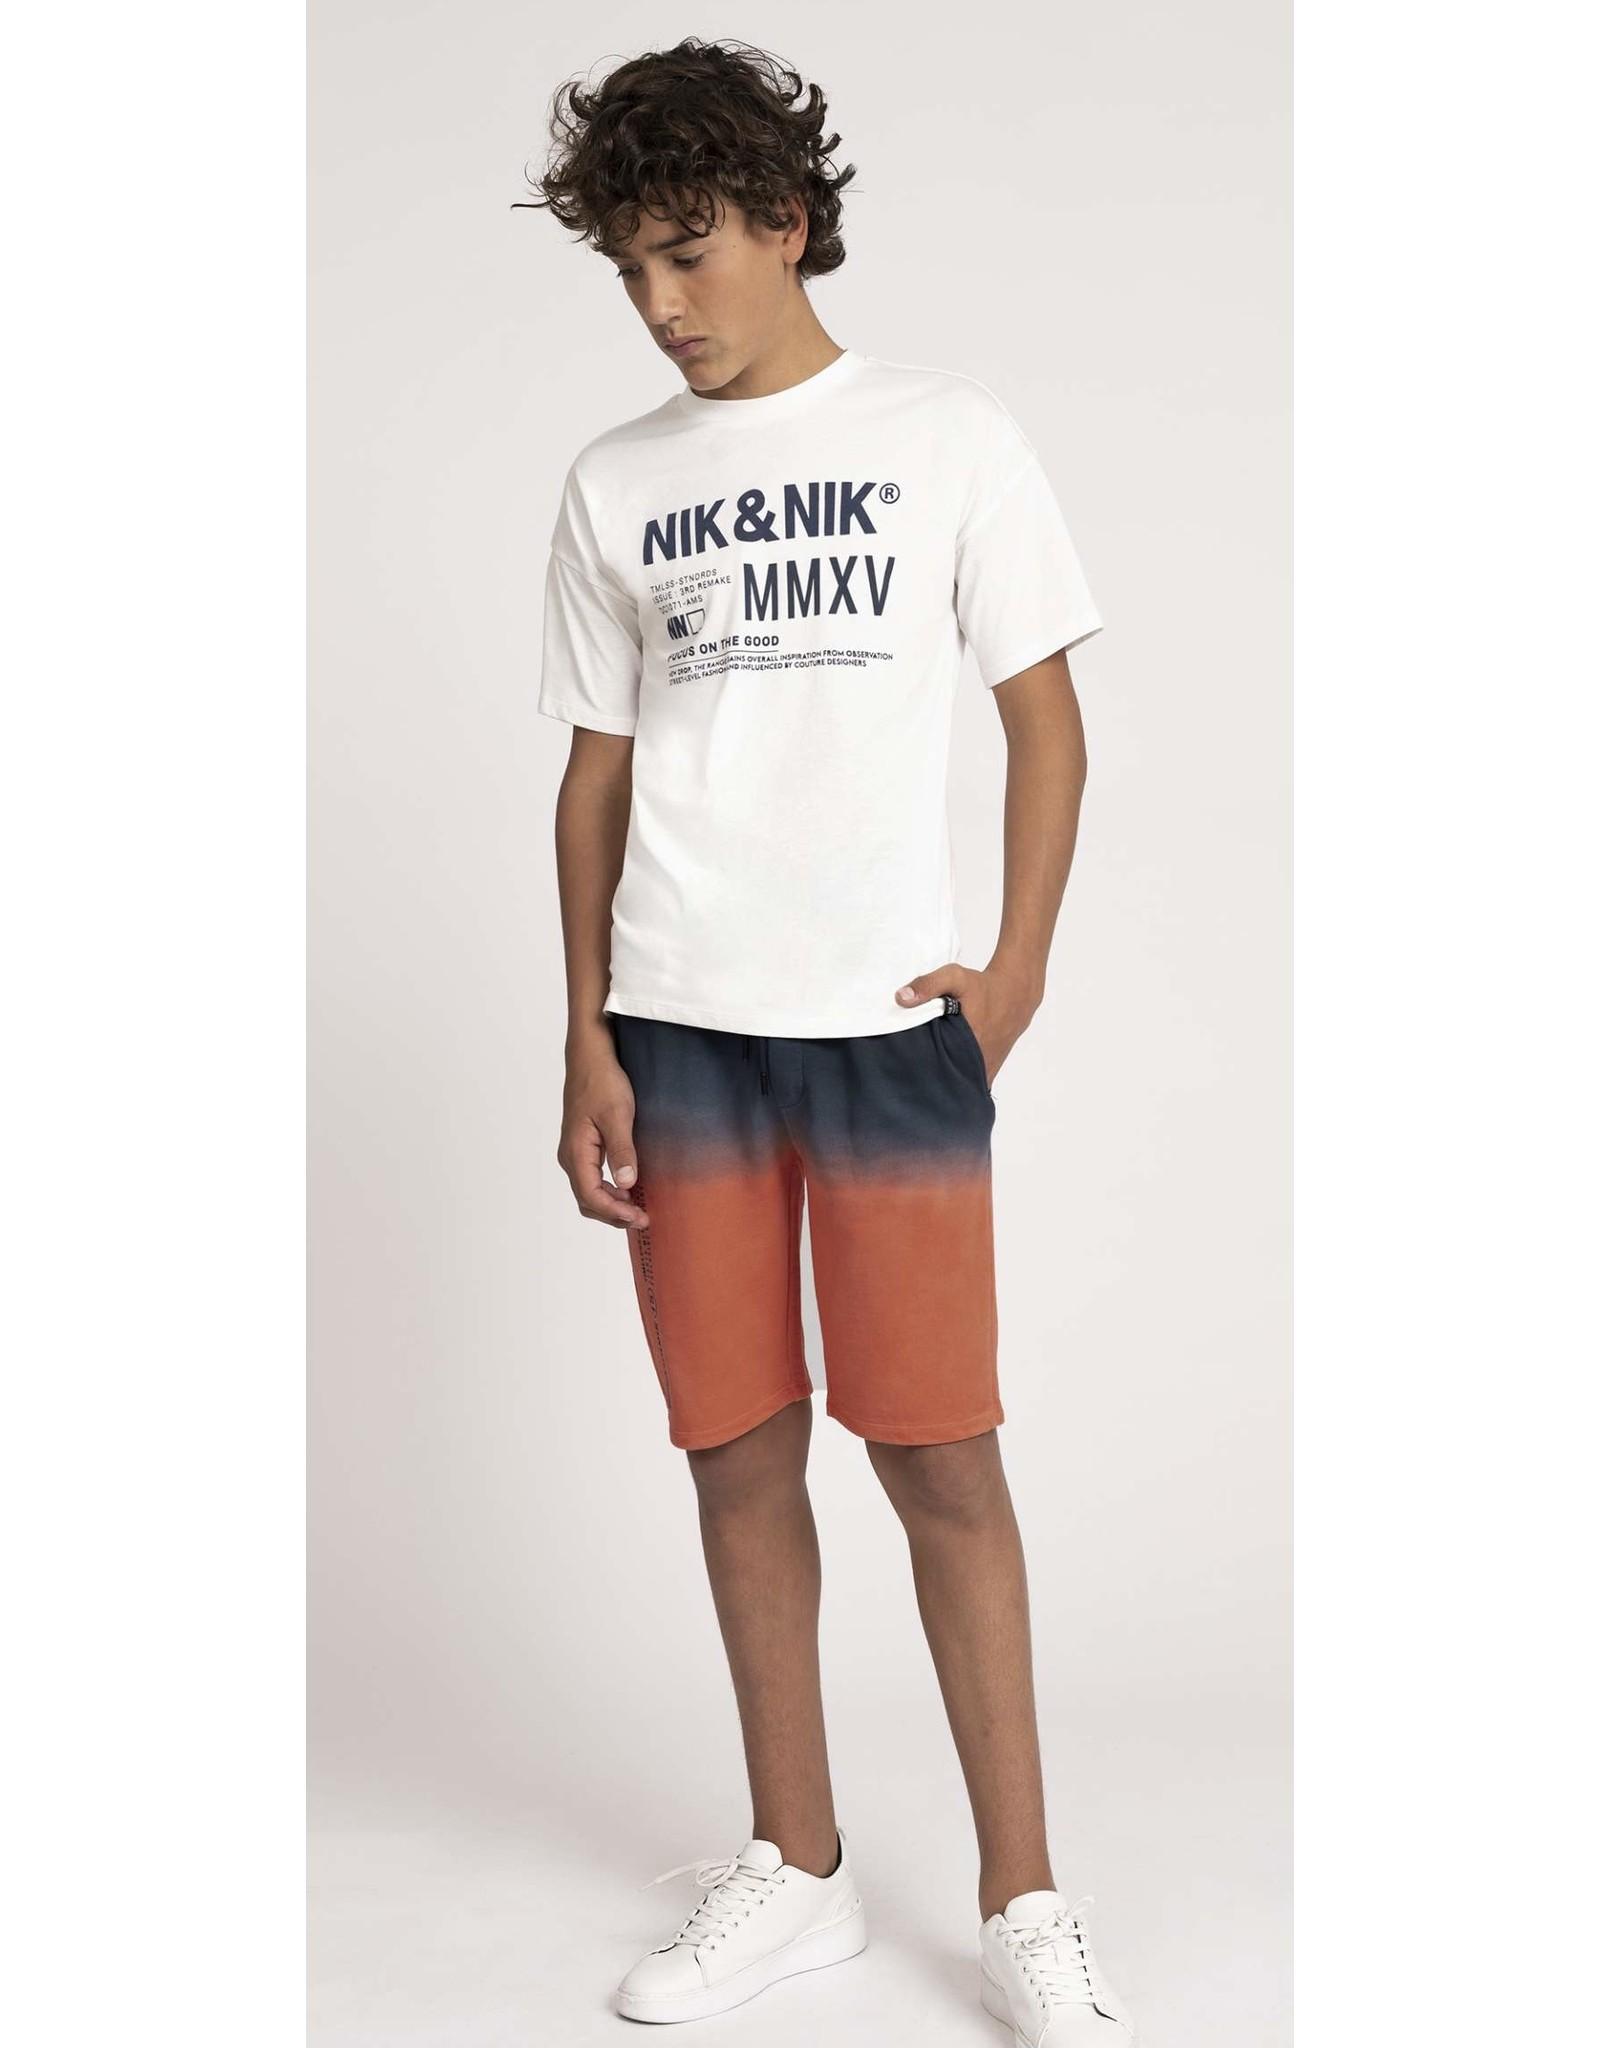 Nik & Nik Alarik T-shirt